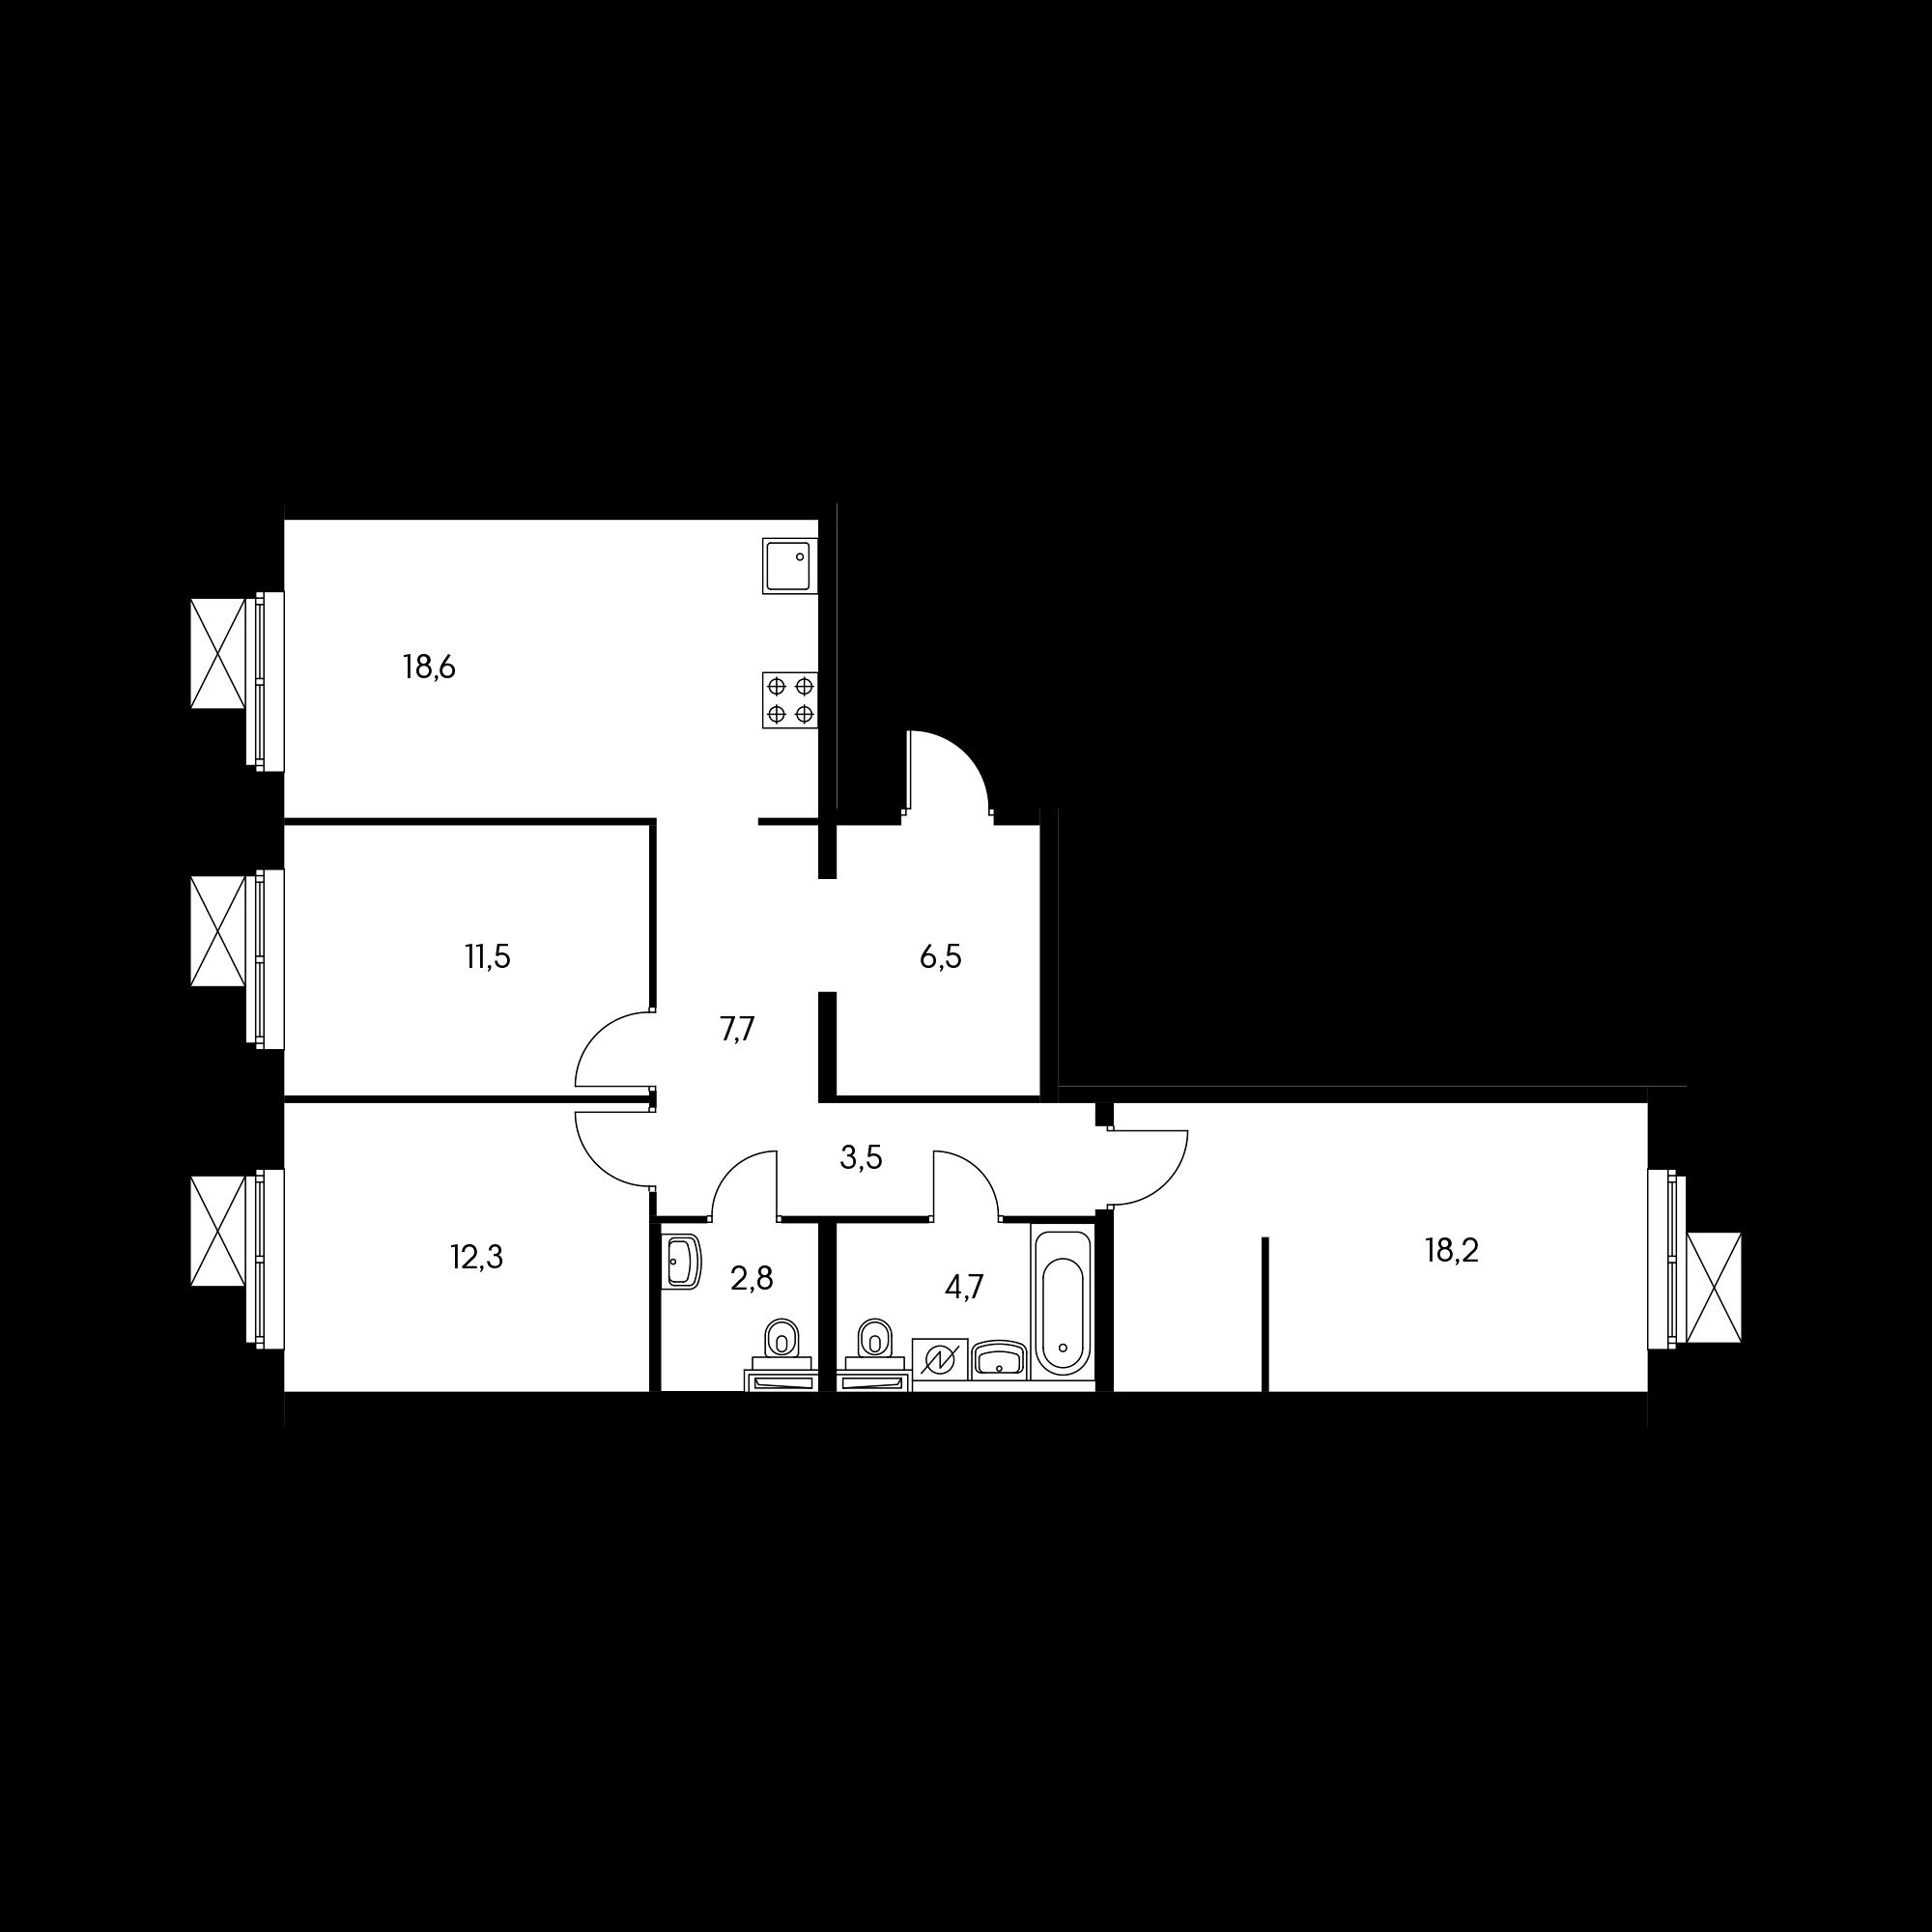 3EL3_9.6-1*